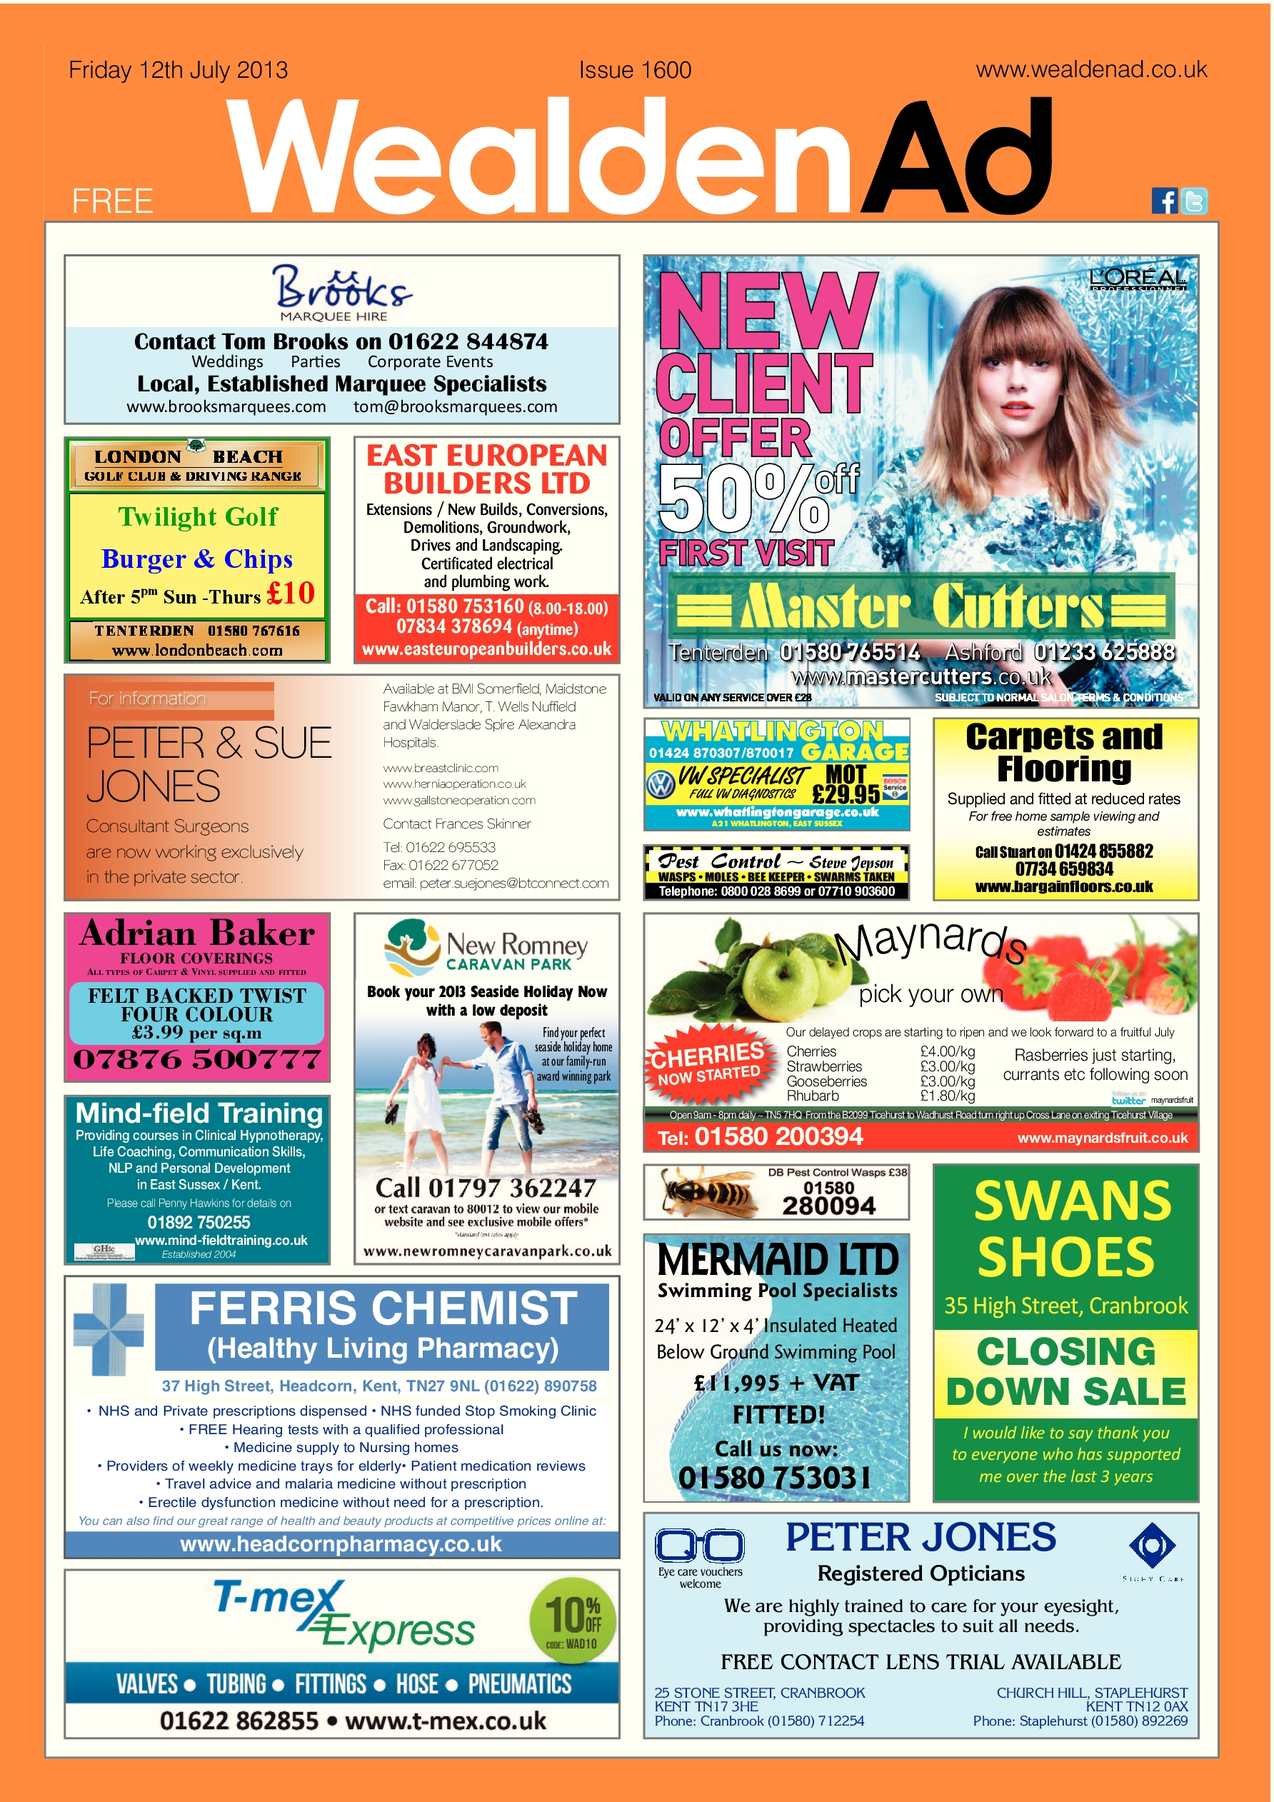 Calaméo - Wealden Advertiser 12 07 2013 ada535976